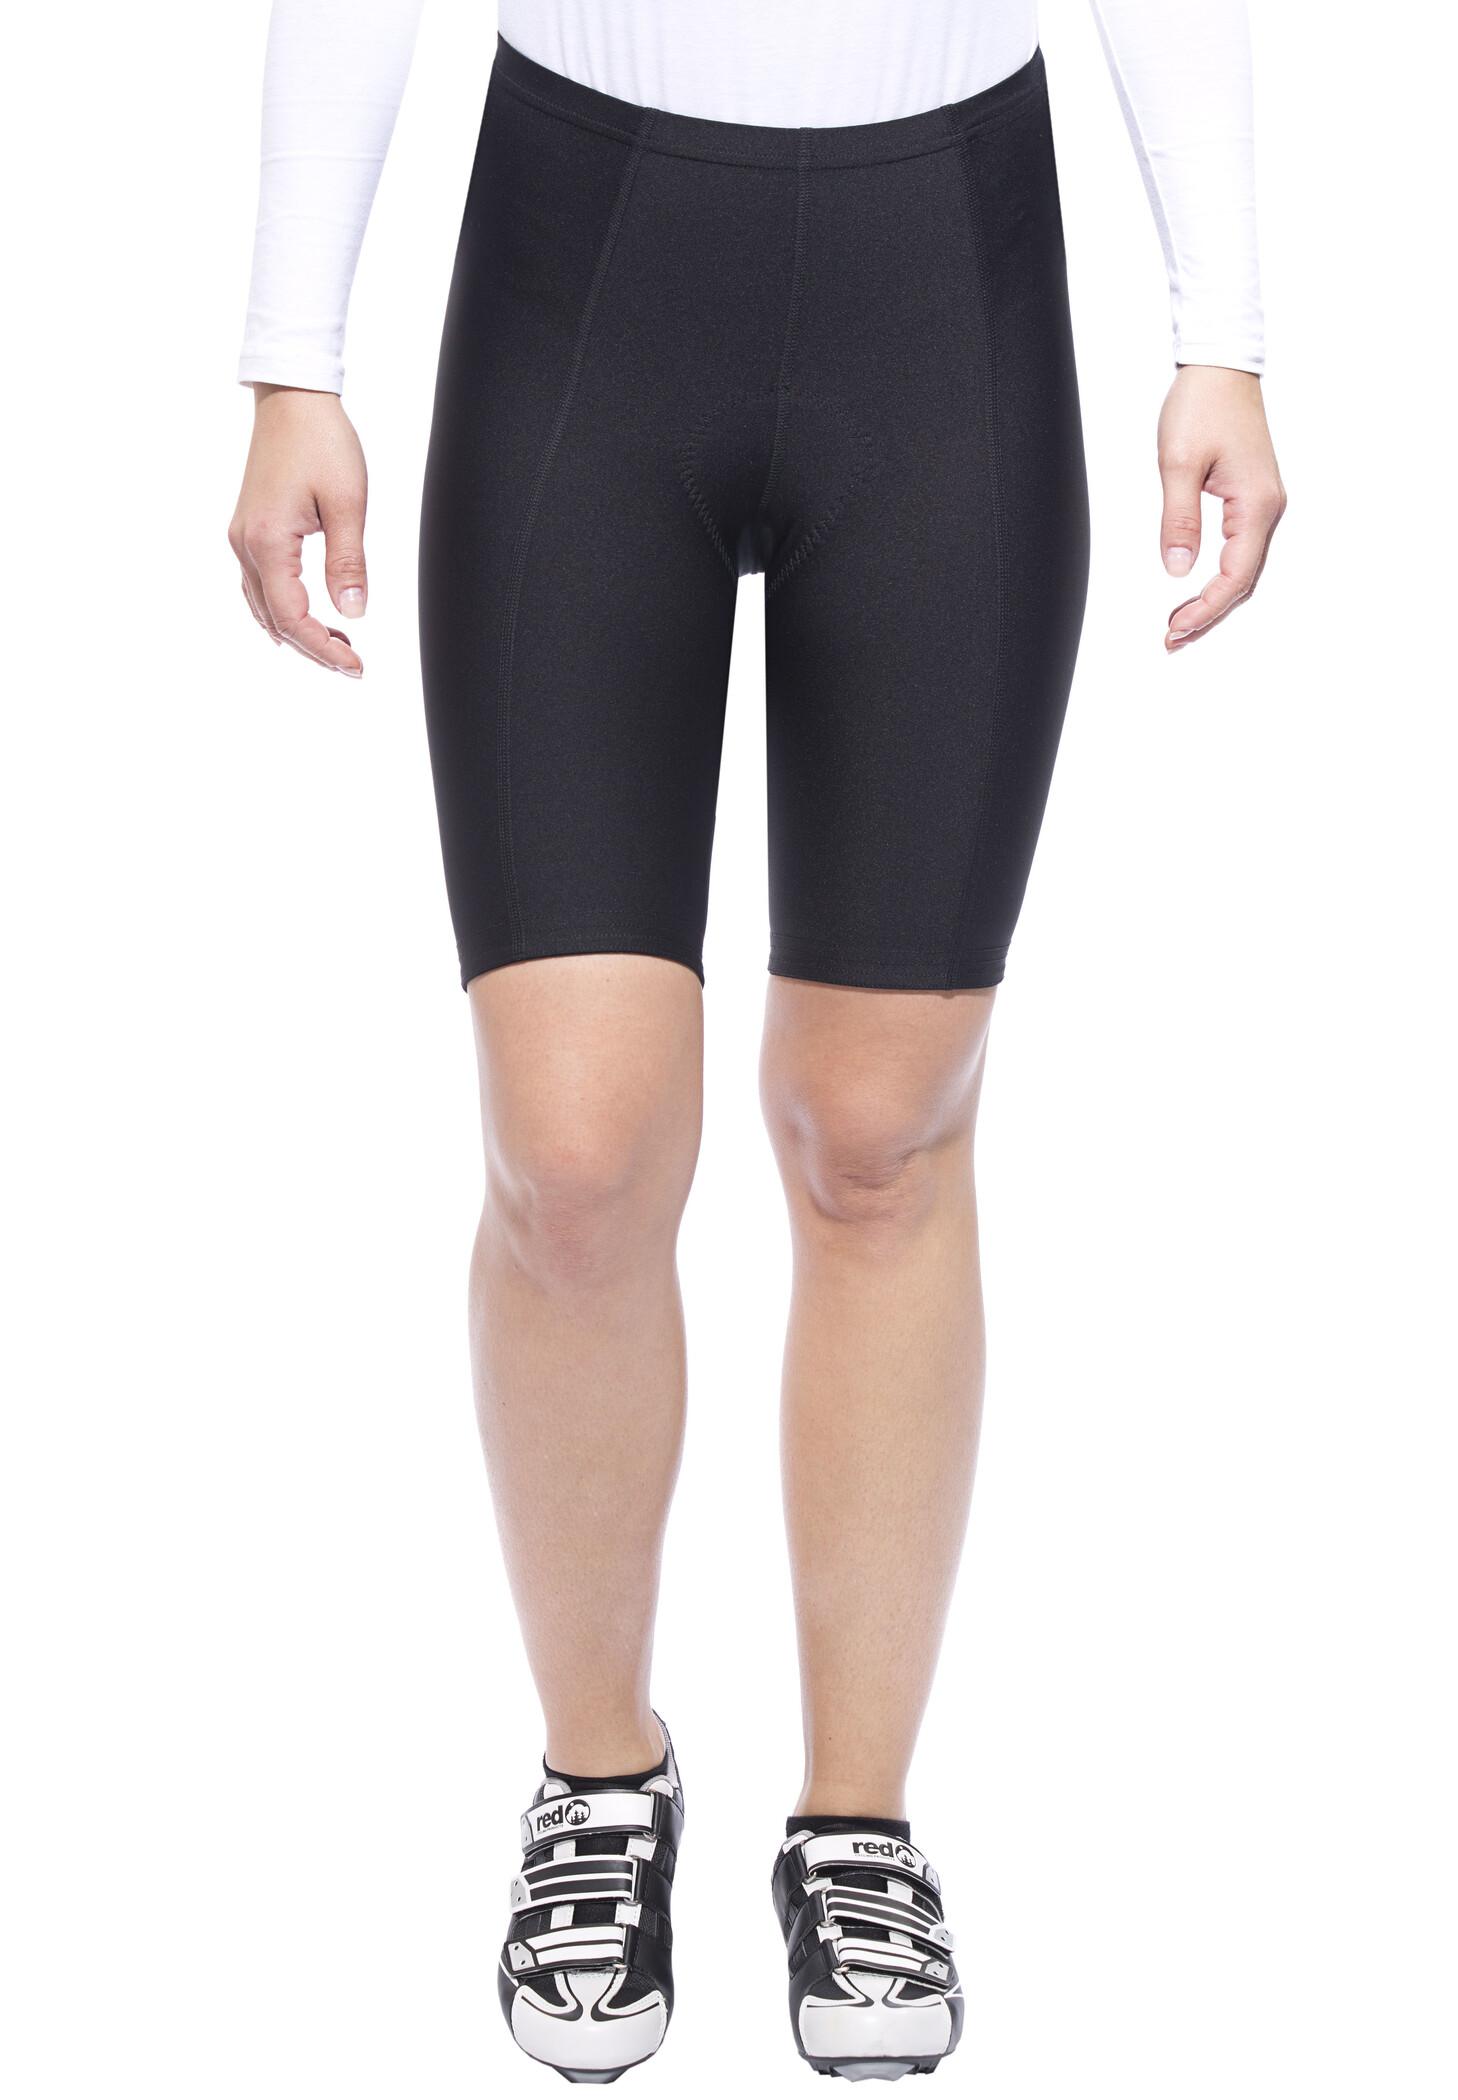 Damen Löffler Tour Radsport Shorts Kurze Hose Radhose Sport Hose Sportbekleidung